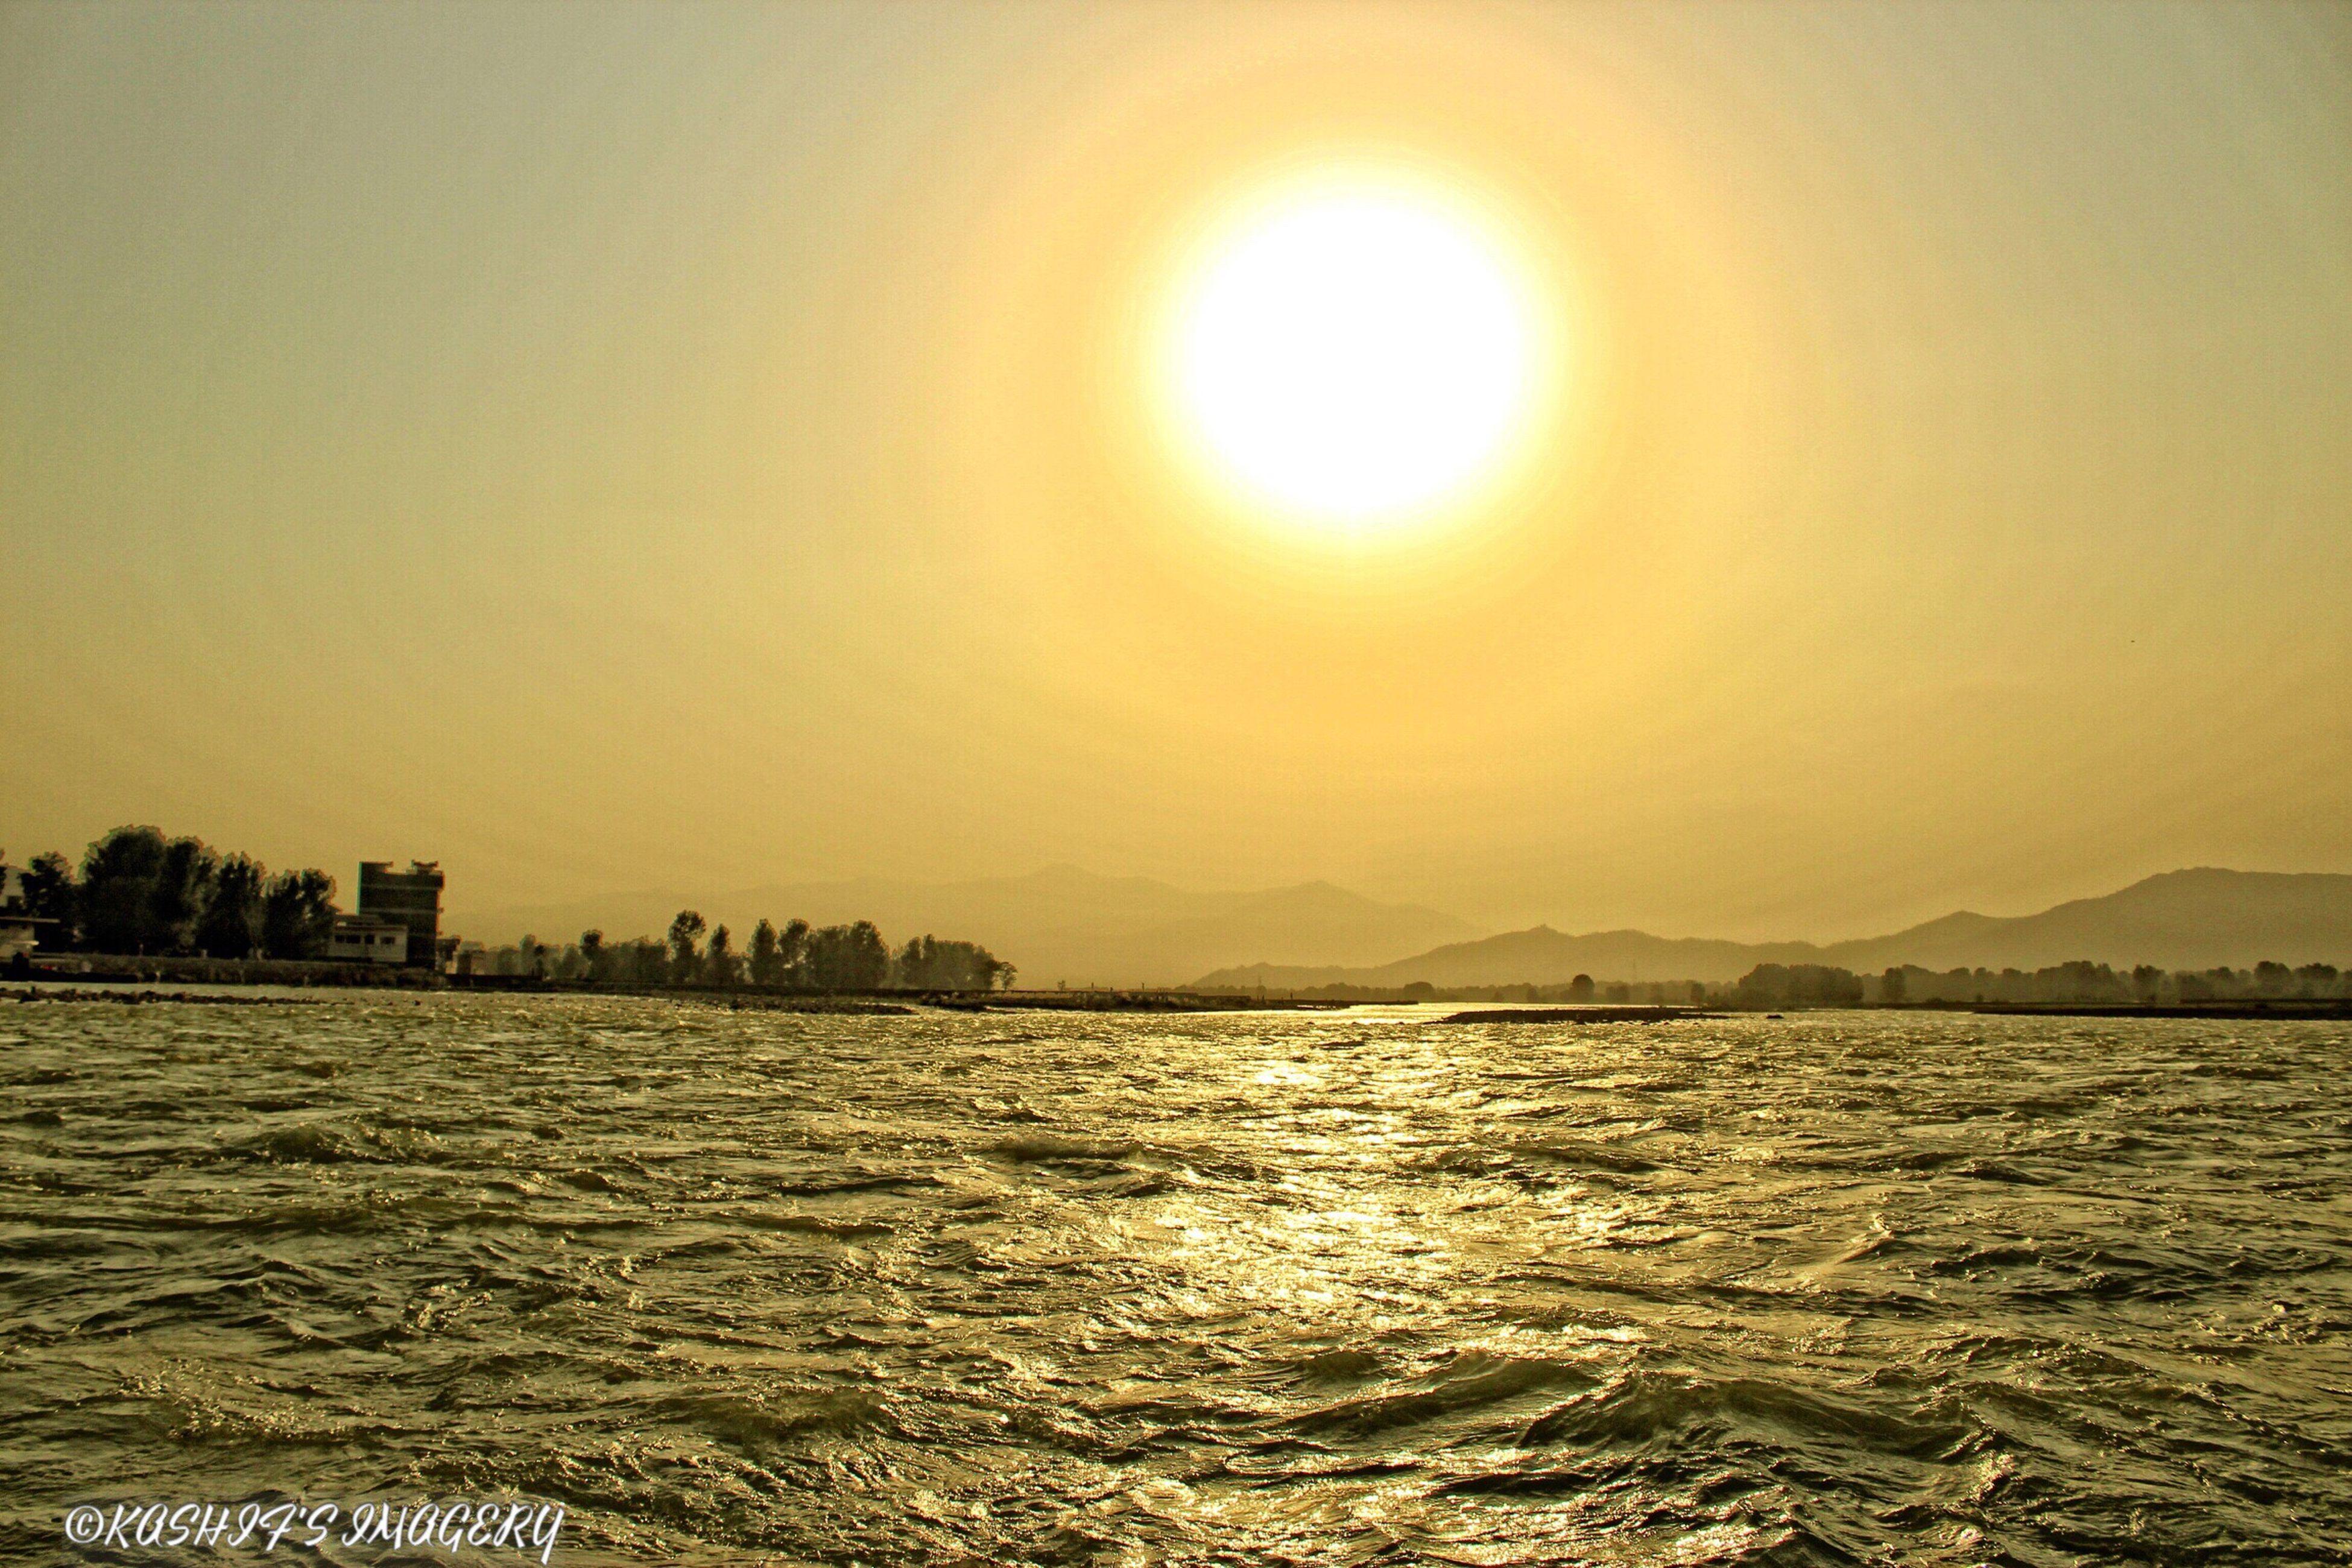 A sunset at Swat River, Fiza Ghatt, Swat #sunset #eveningvibes #eveningshades #orange #riverside #swatriver #swat #summers #away #fiftyshadesofnature